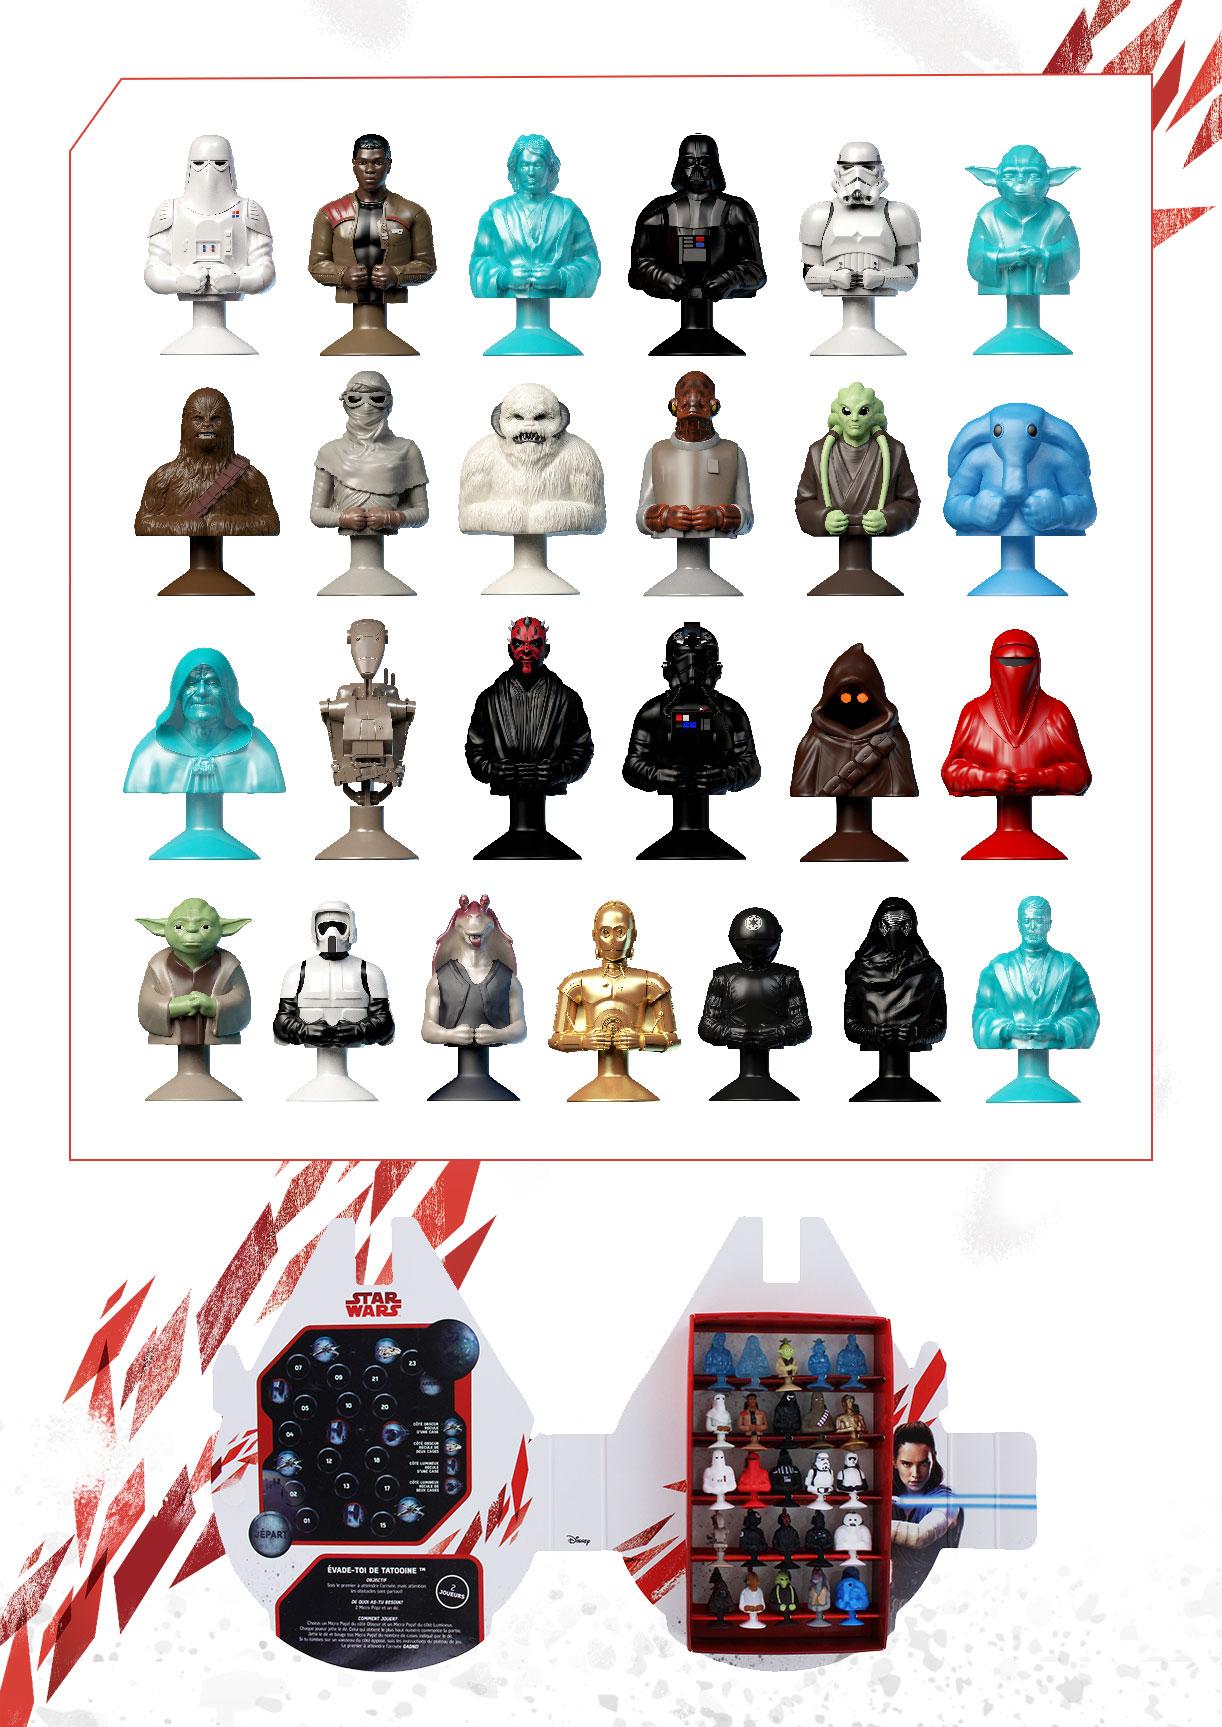 des figurines micropopz star wars retrouver chez leclerc star wars holonet. Black Bedroom Furniture Sets. Home Design Ideas